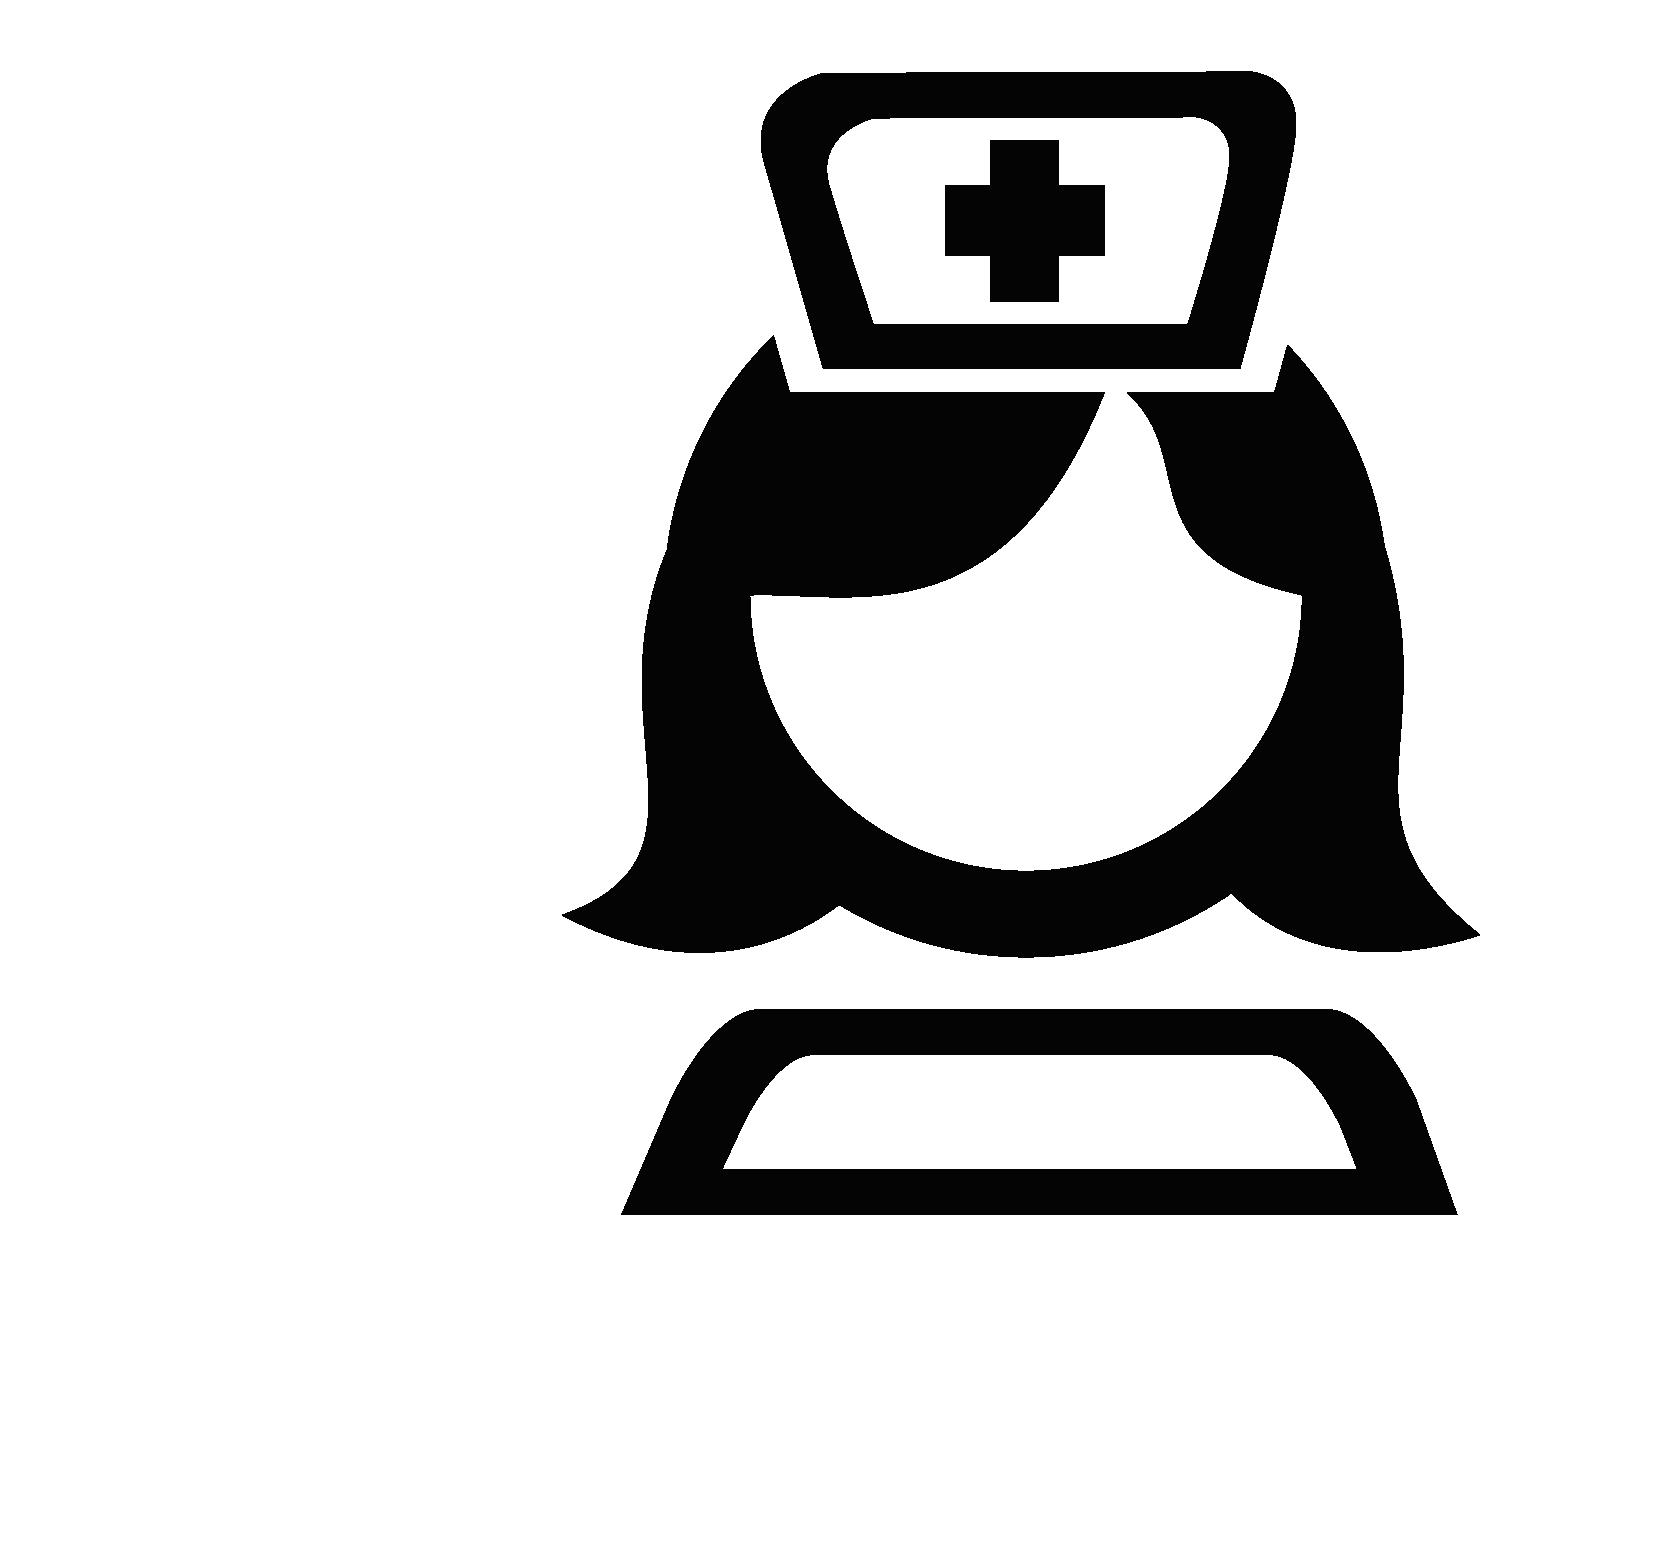 Nursing clipart nurse symbol. Apple icon image format